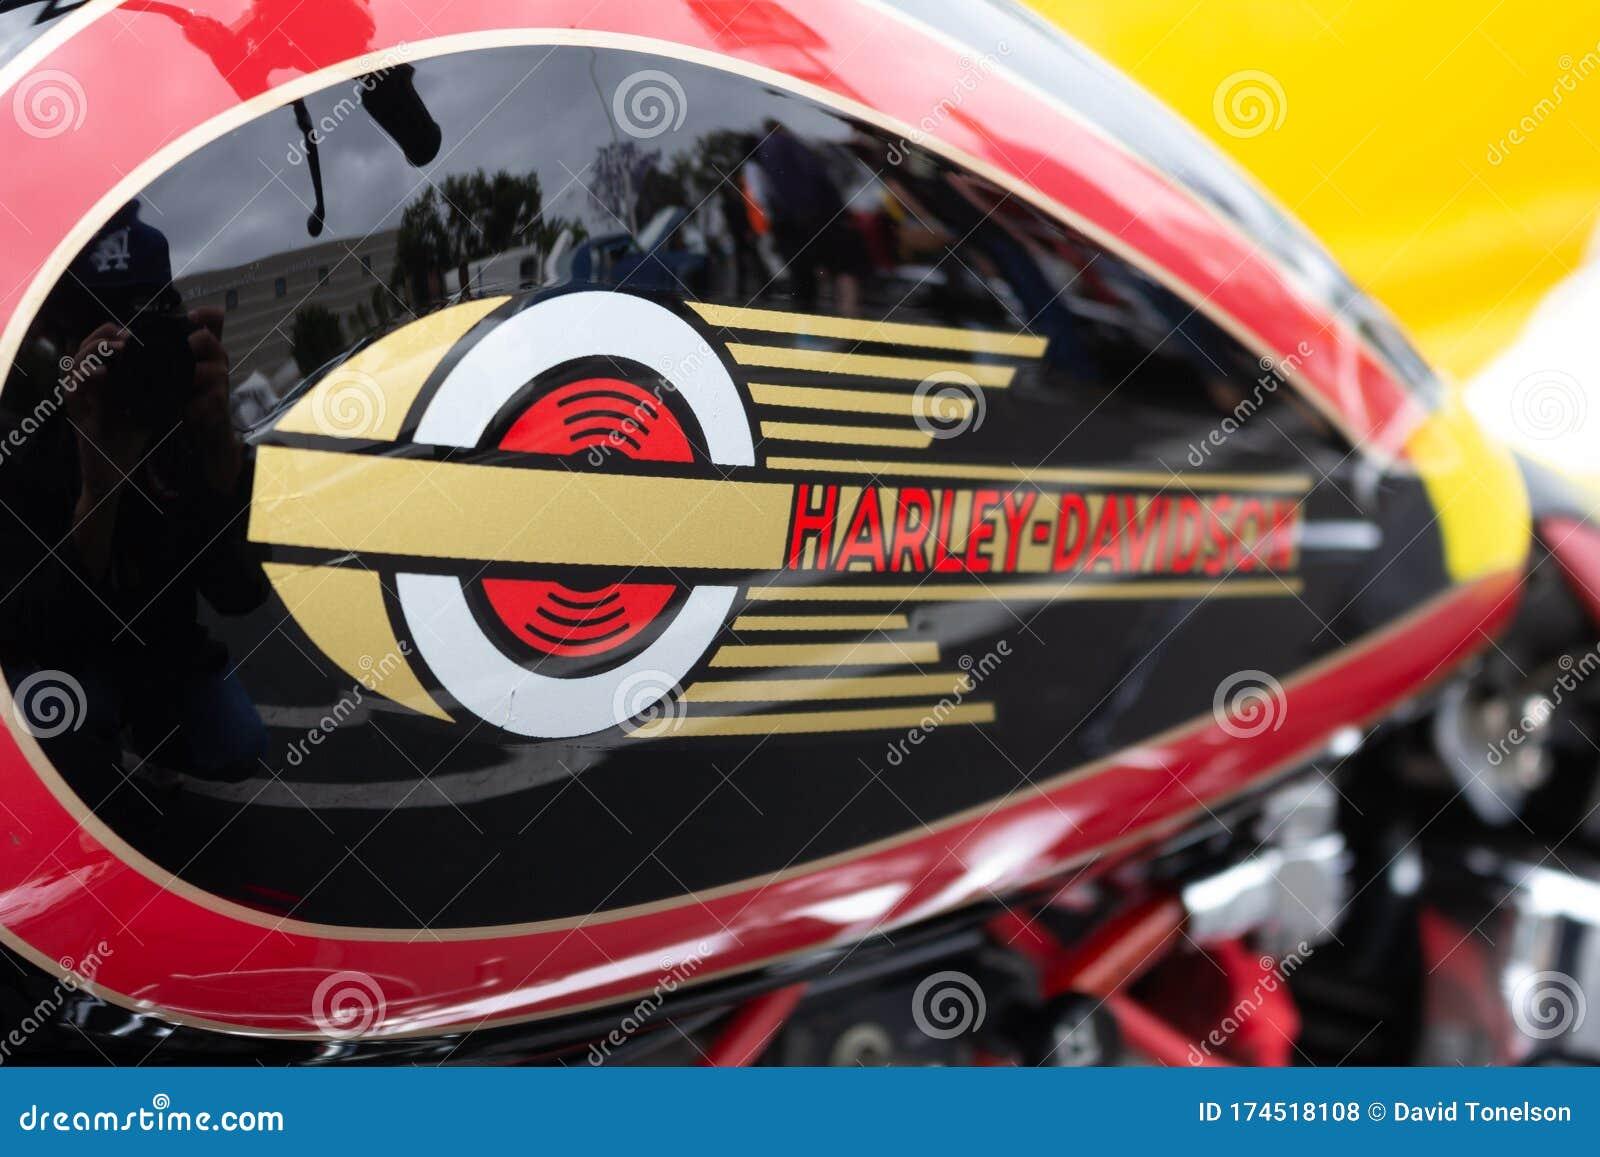 Harley Davidson Logo Editorial Stock Photo Image Of Fast 174518108